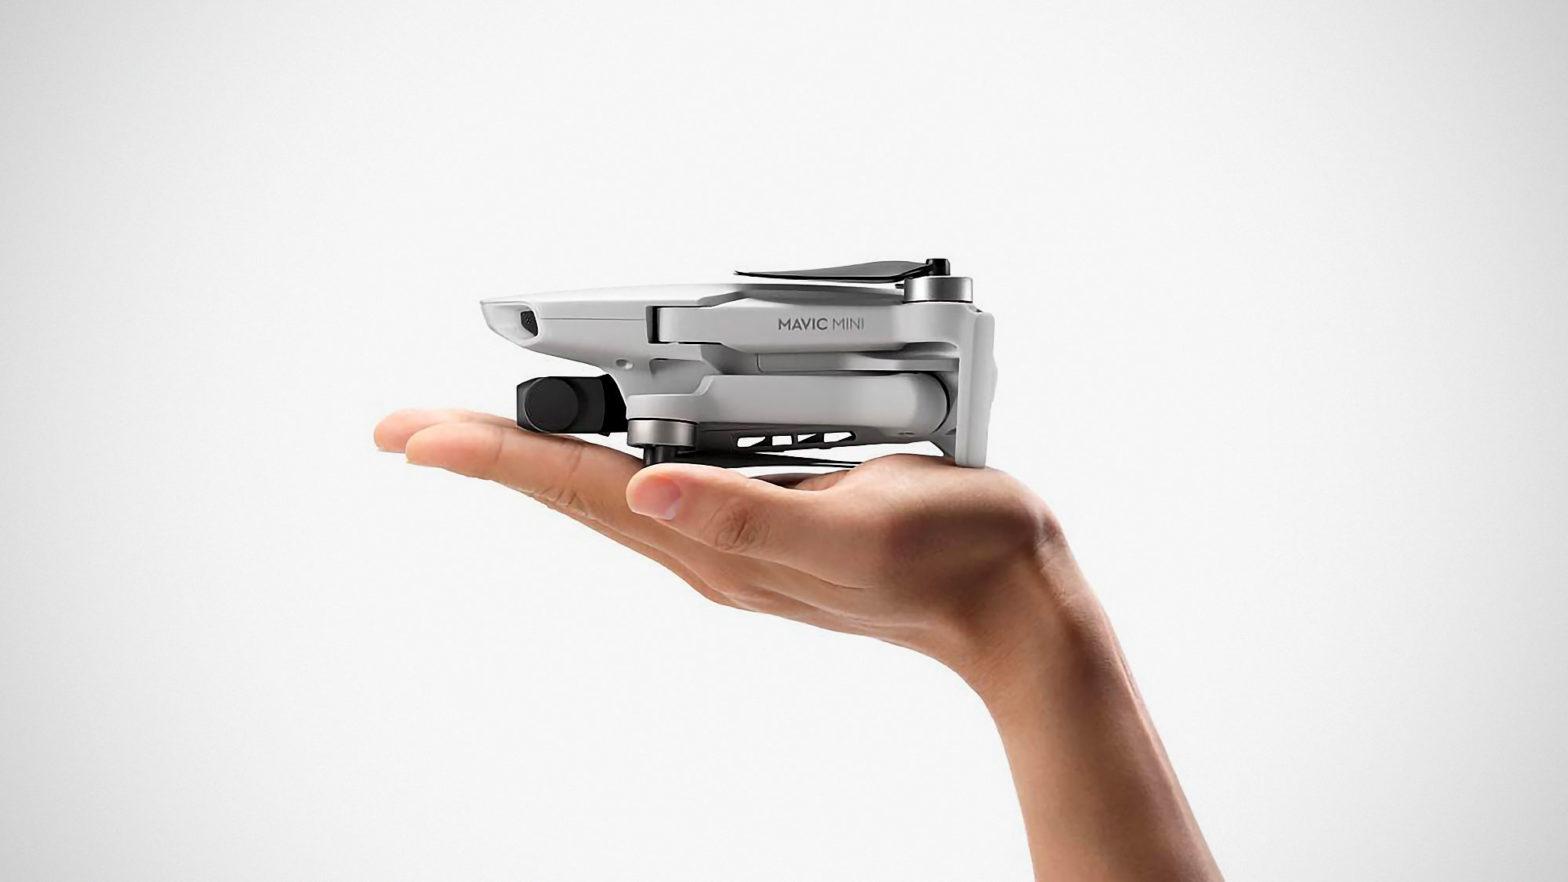 DJI Mavic Mini Imaging Drone